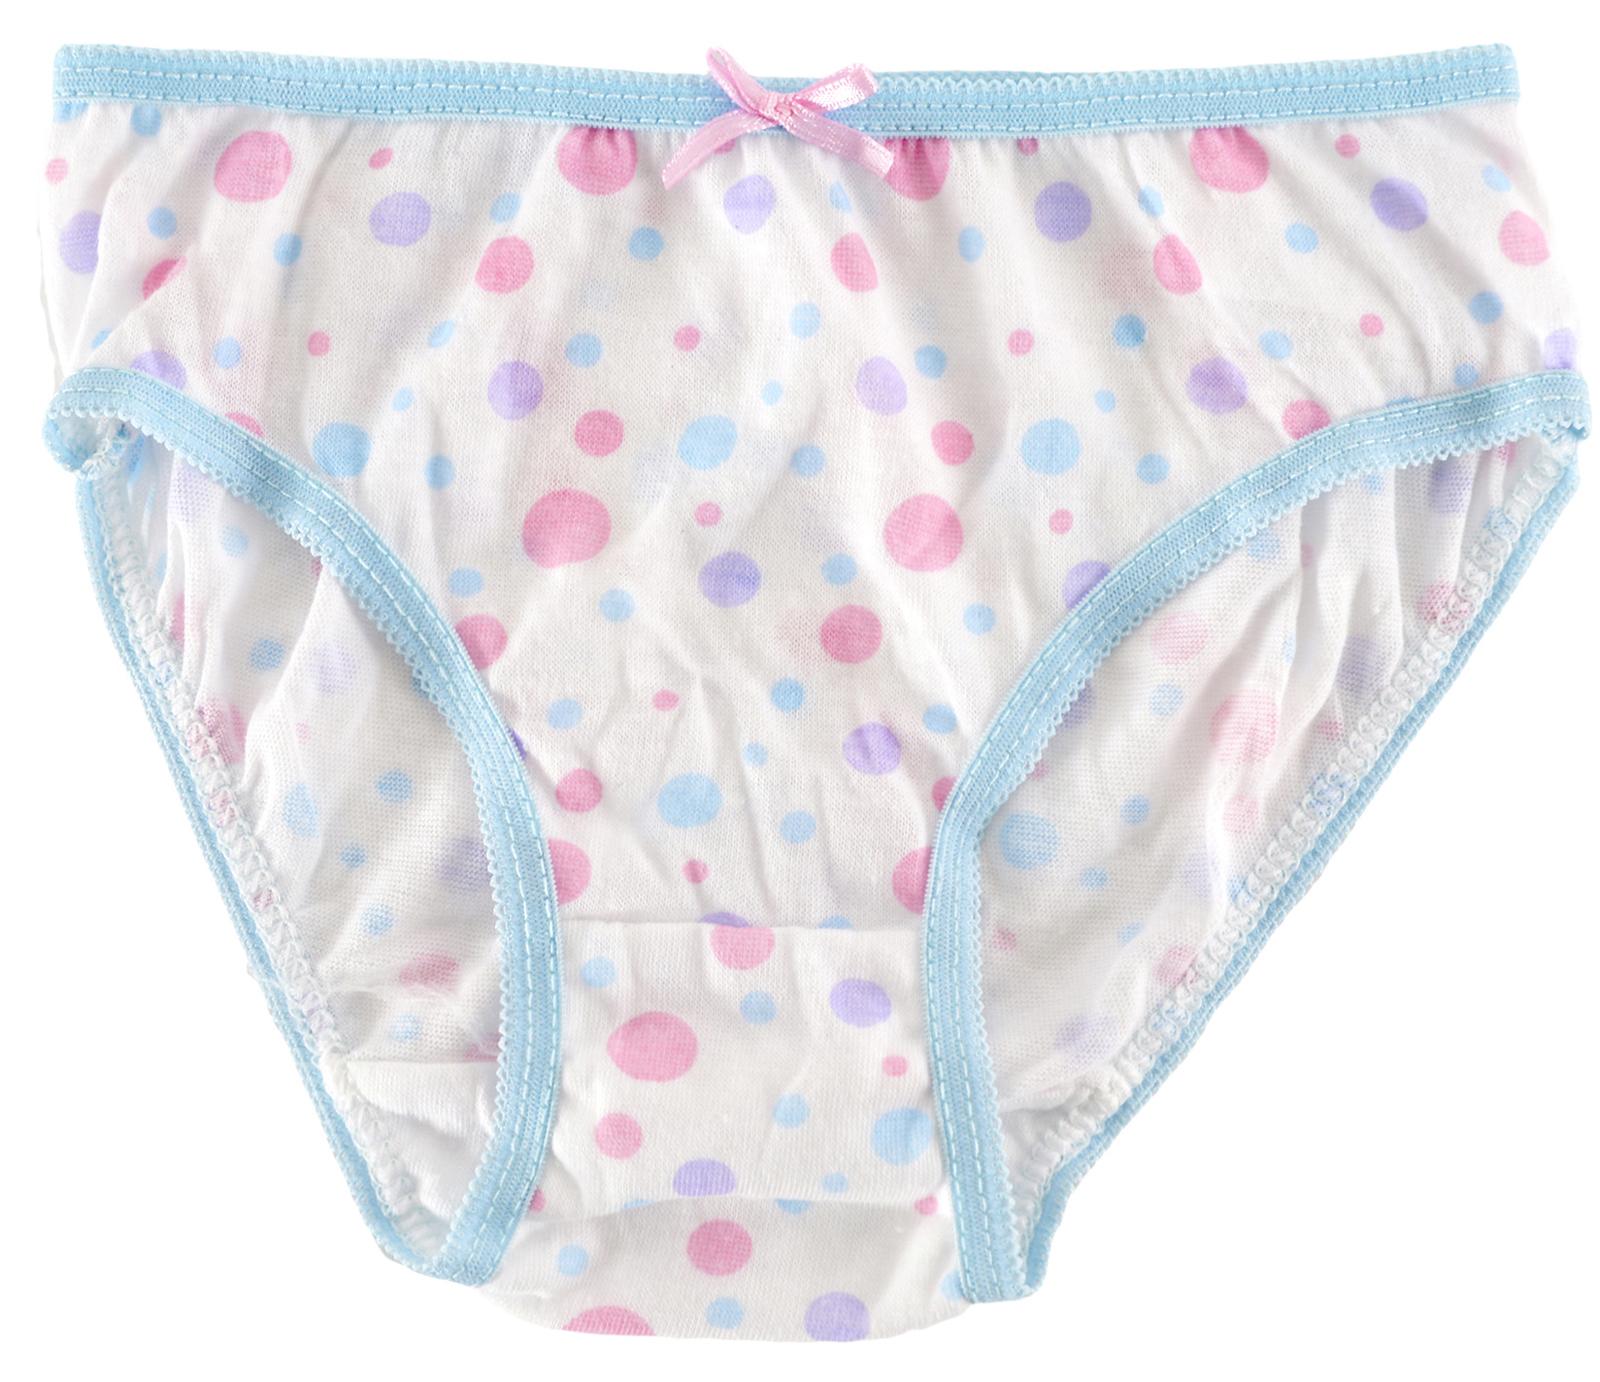 477c7e65c1 Kids Girls Boys 7 Pairs Pack 100% Cotton Briefs Knickers Pants ...